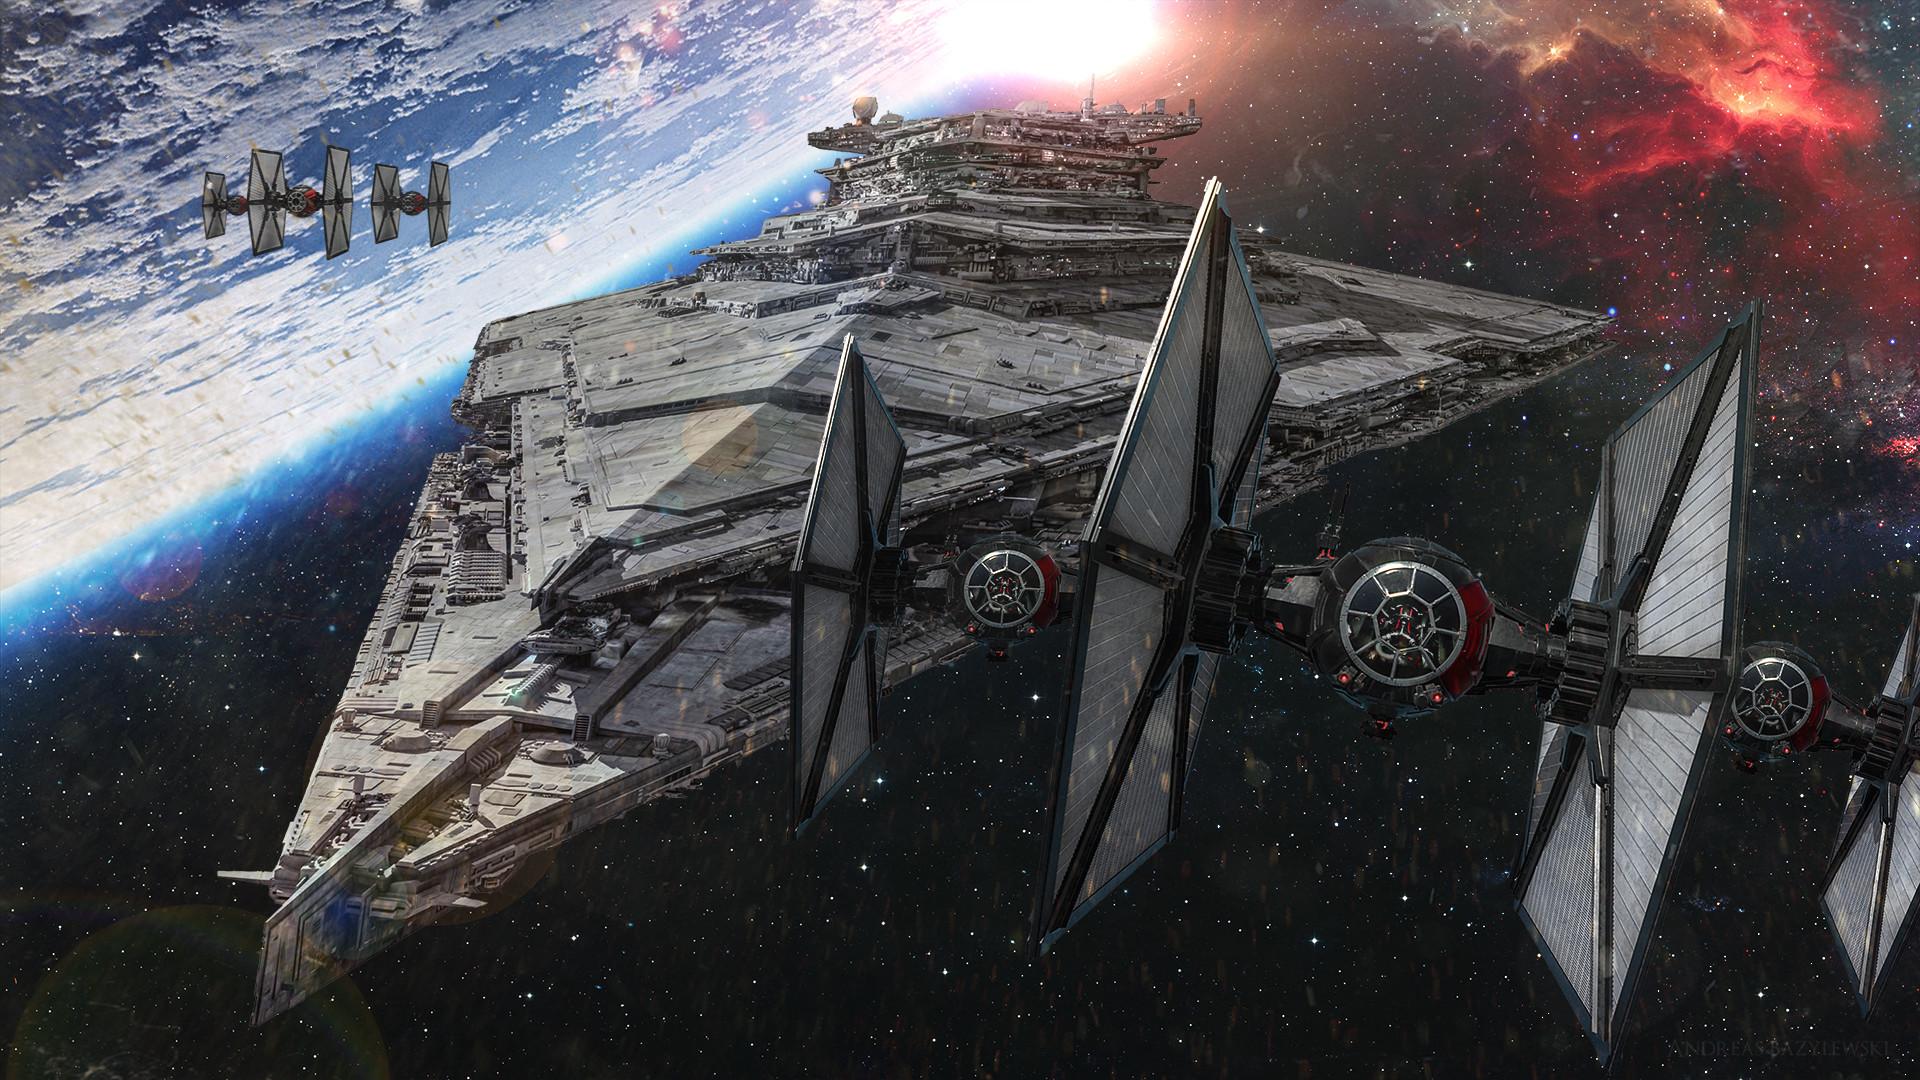 Star Wars Desktop Wallpaper 69 Images